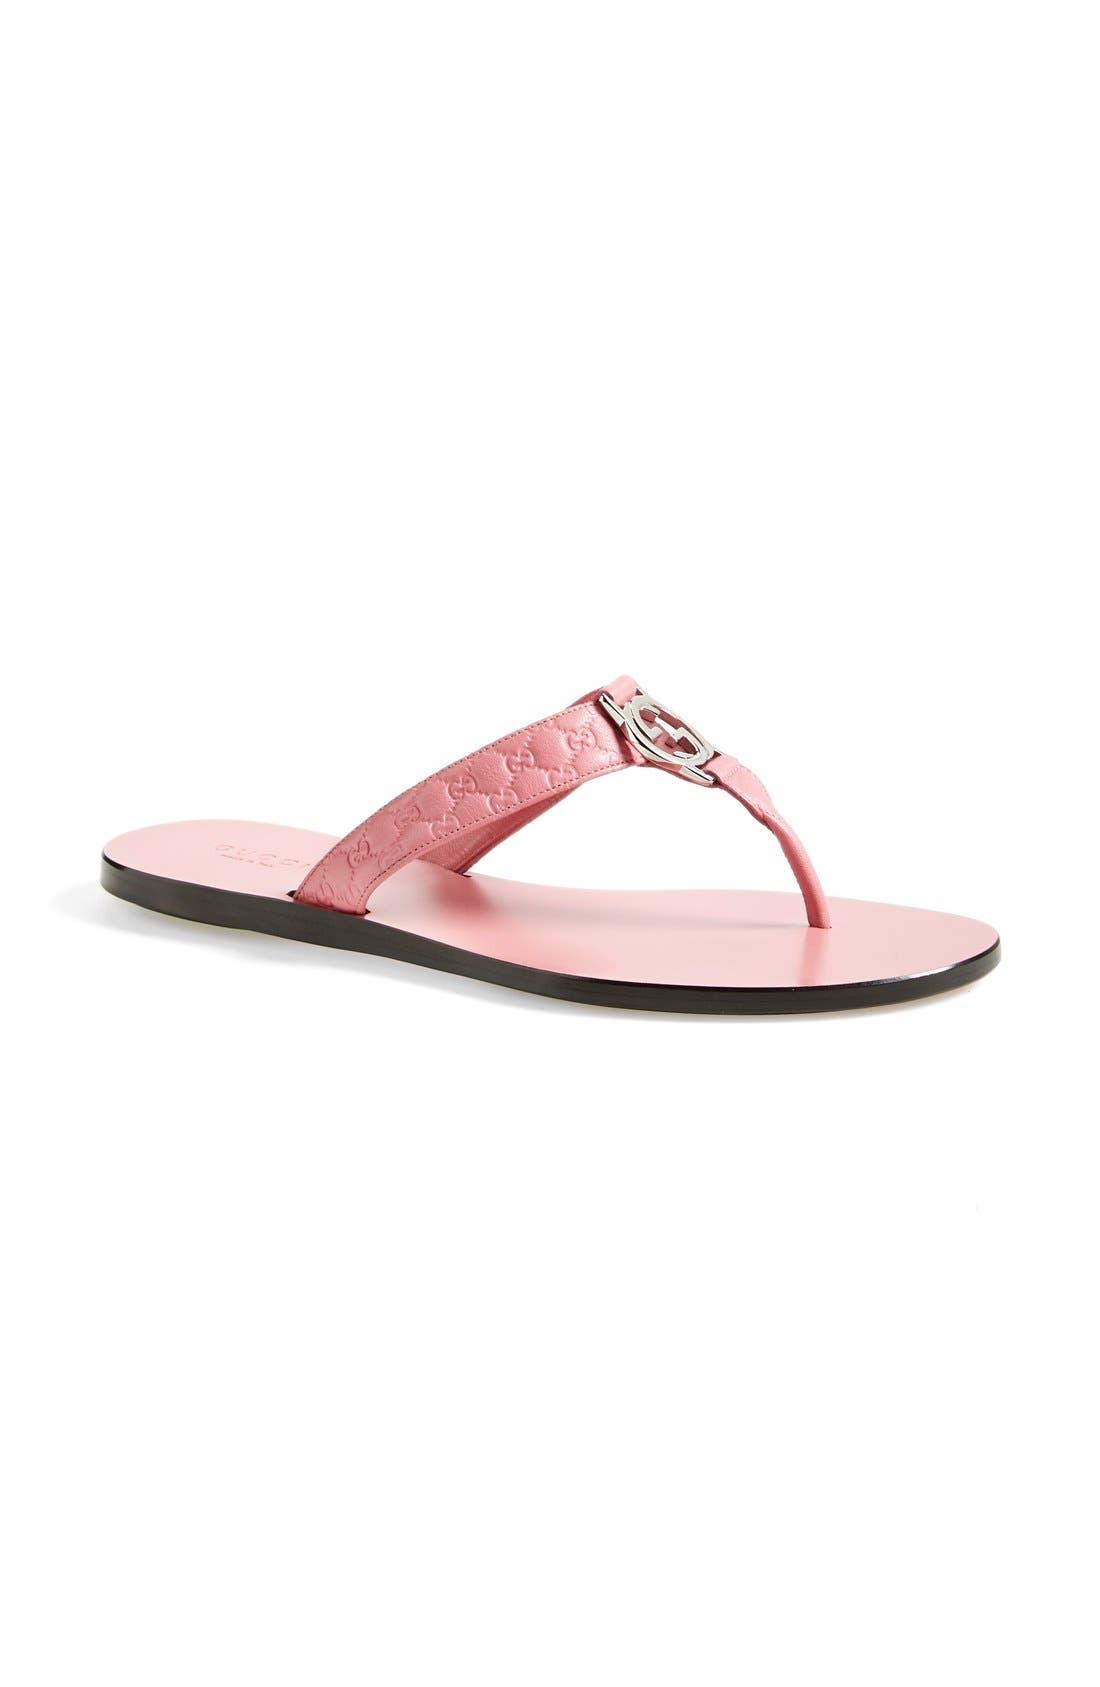 Gucci 'GG' Thong Sandal (Women)   Nordstrom